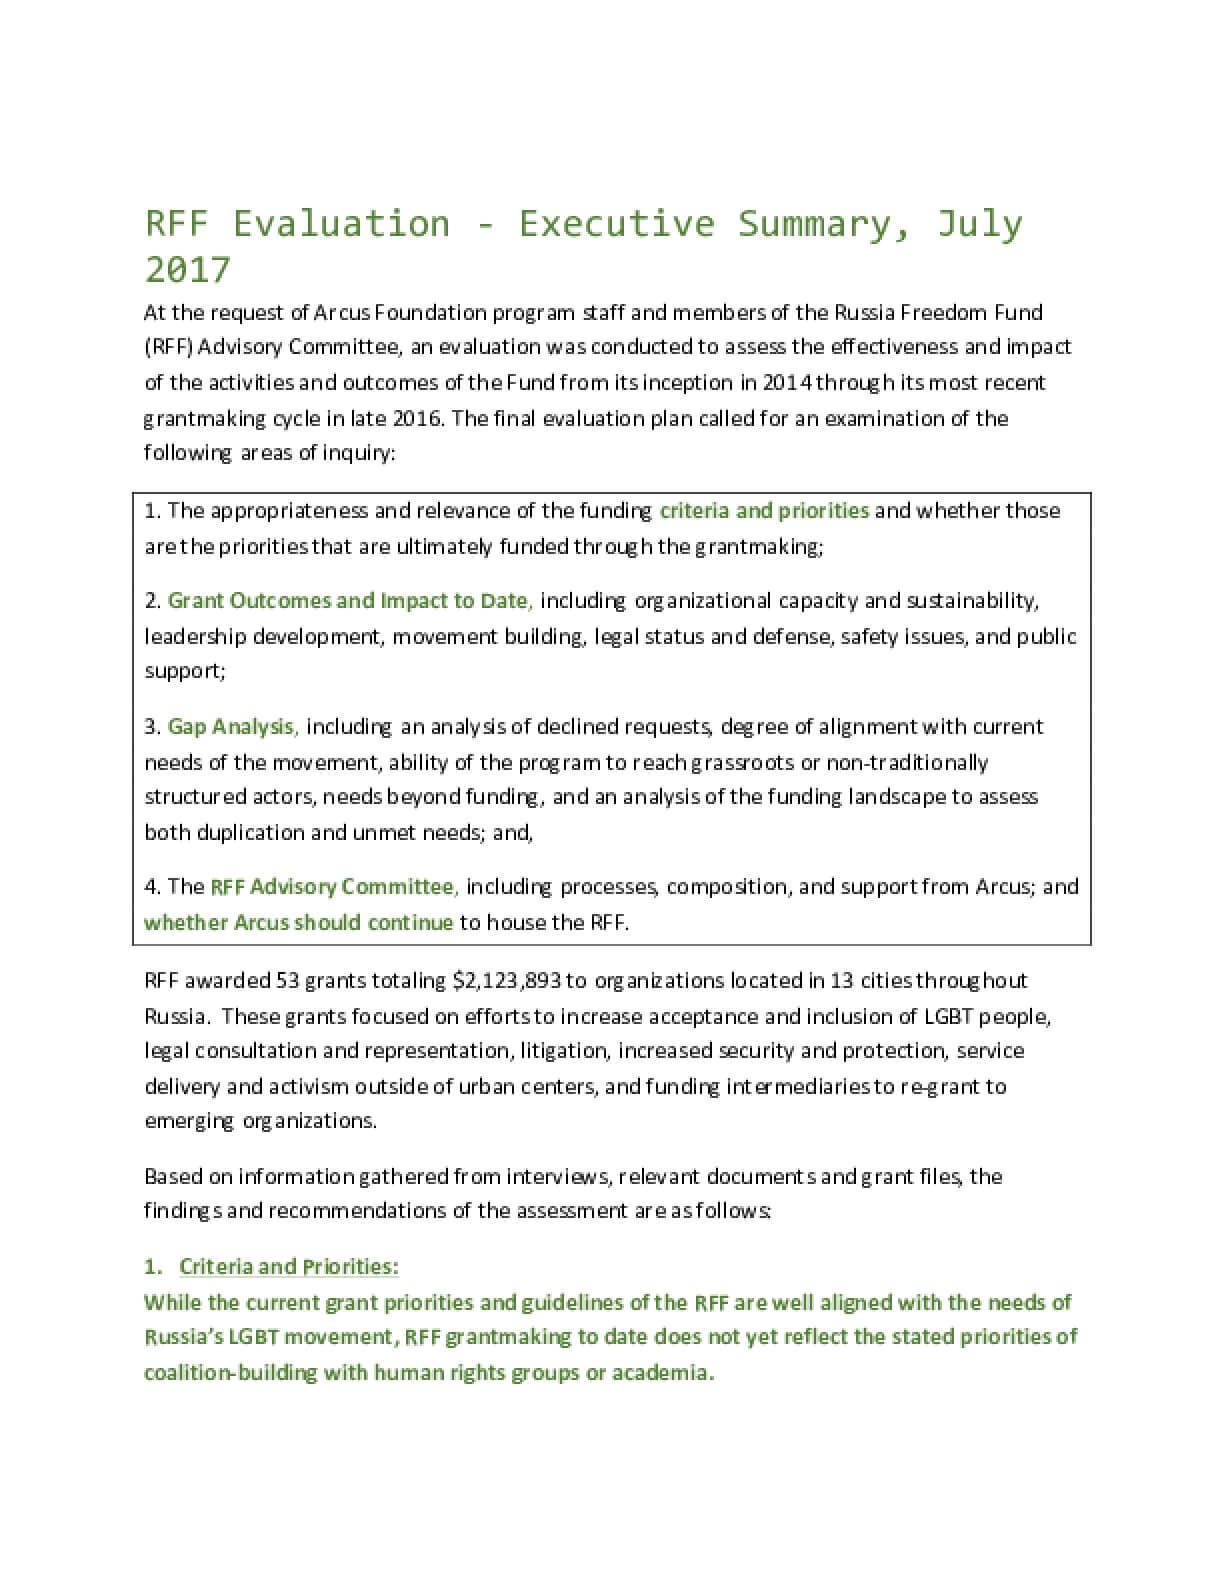 Russia Freedom Fund Evaluation (2017)